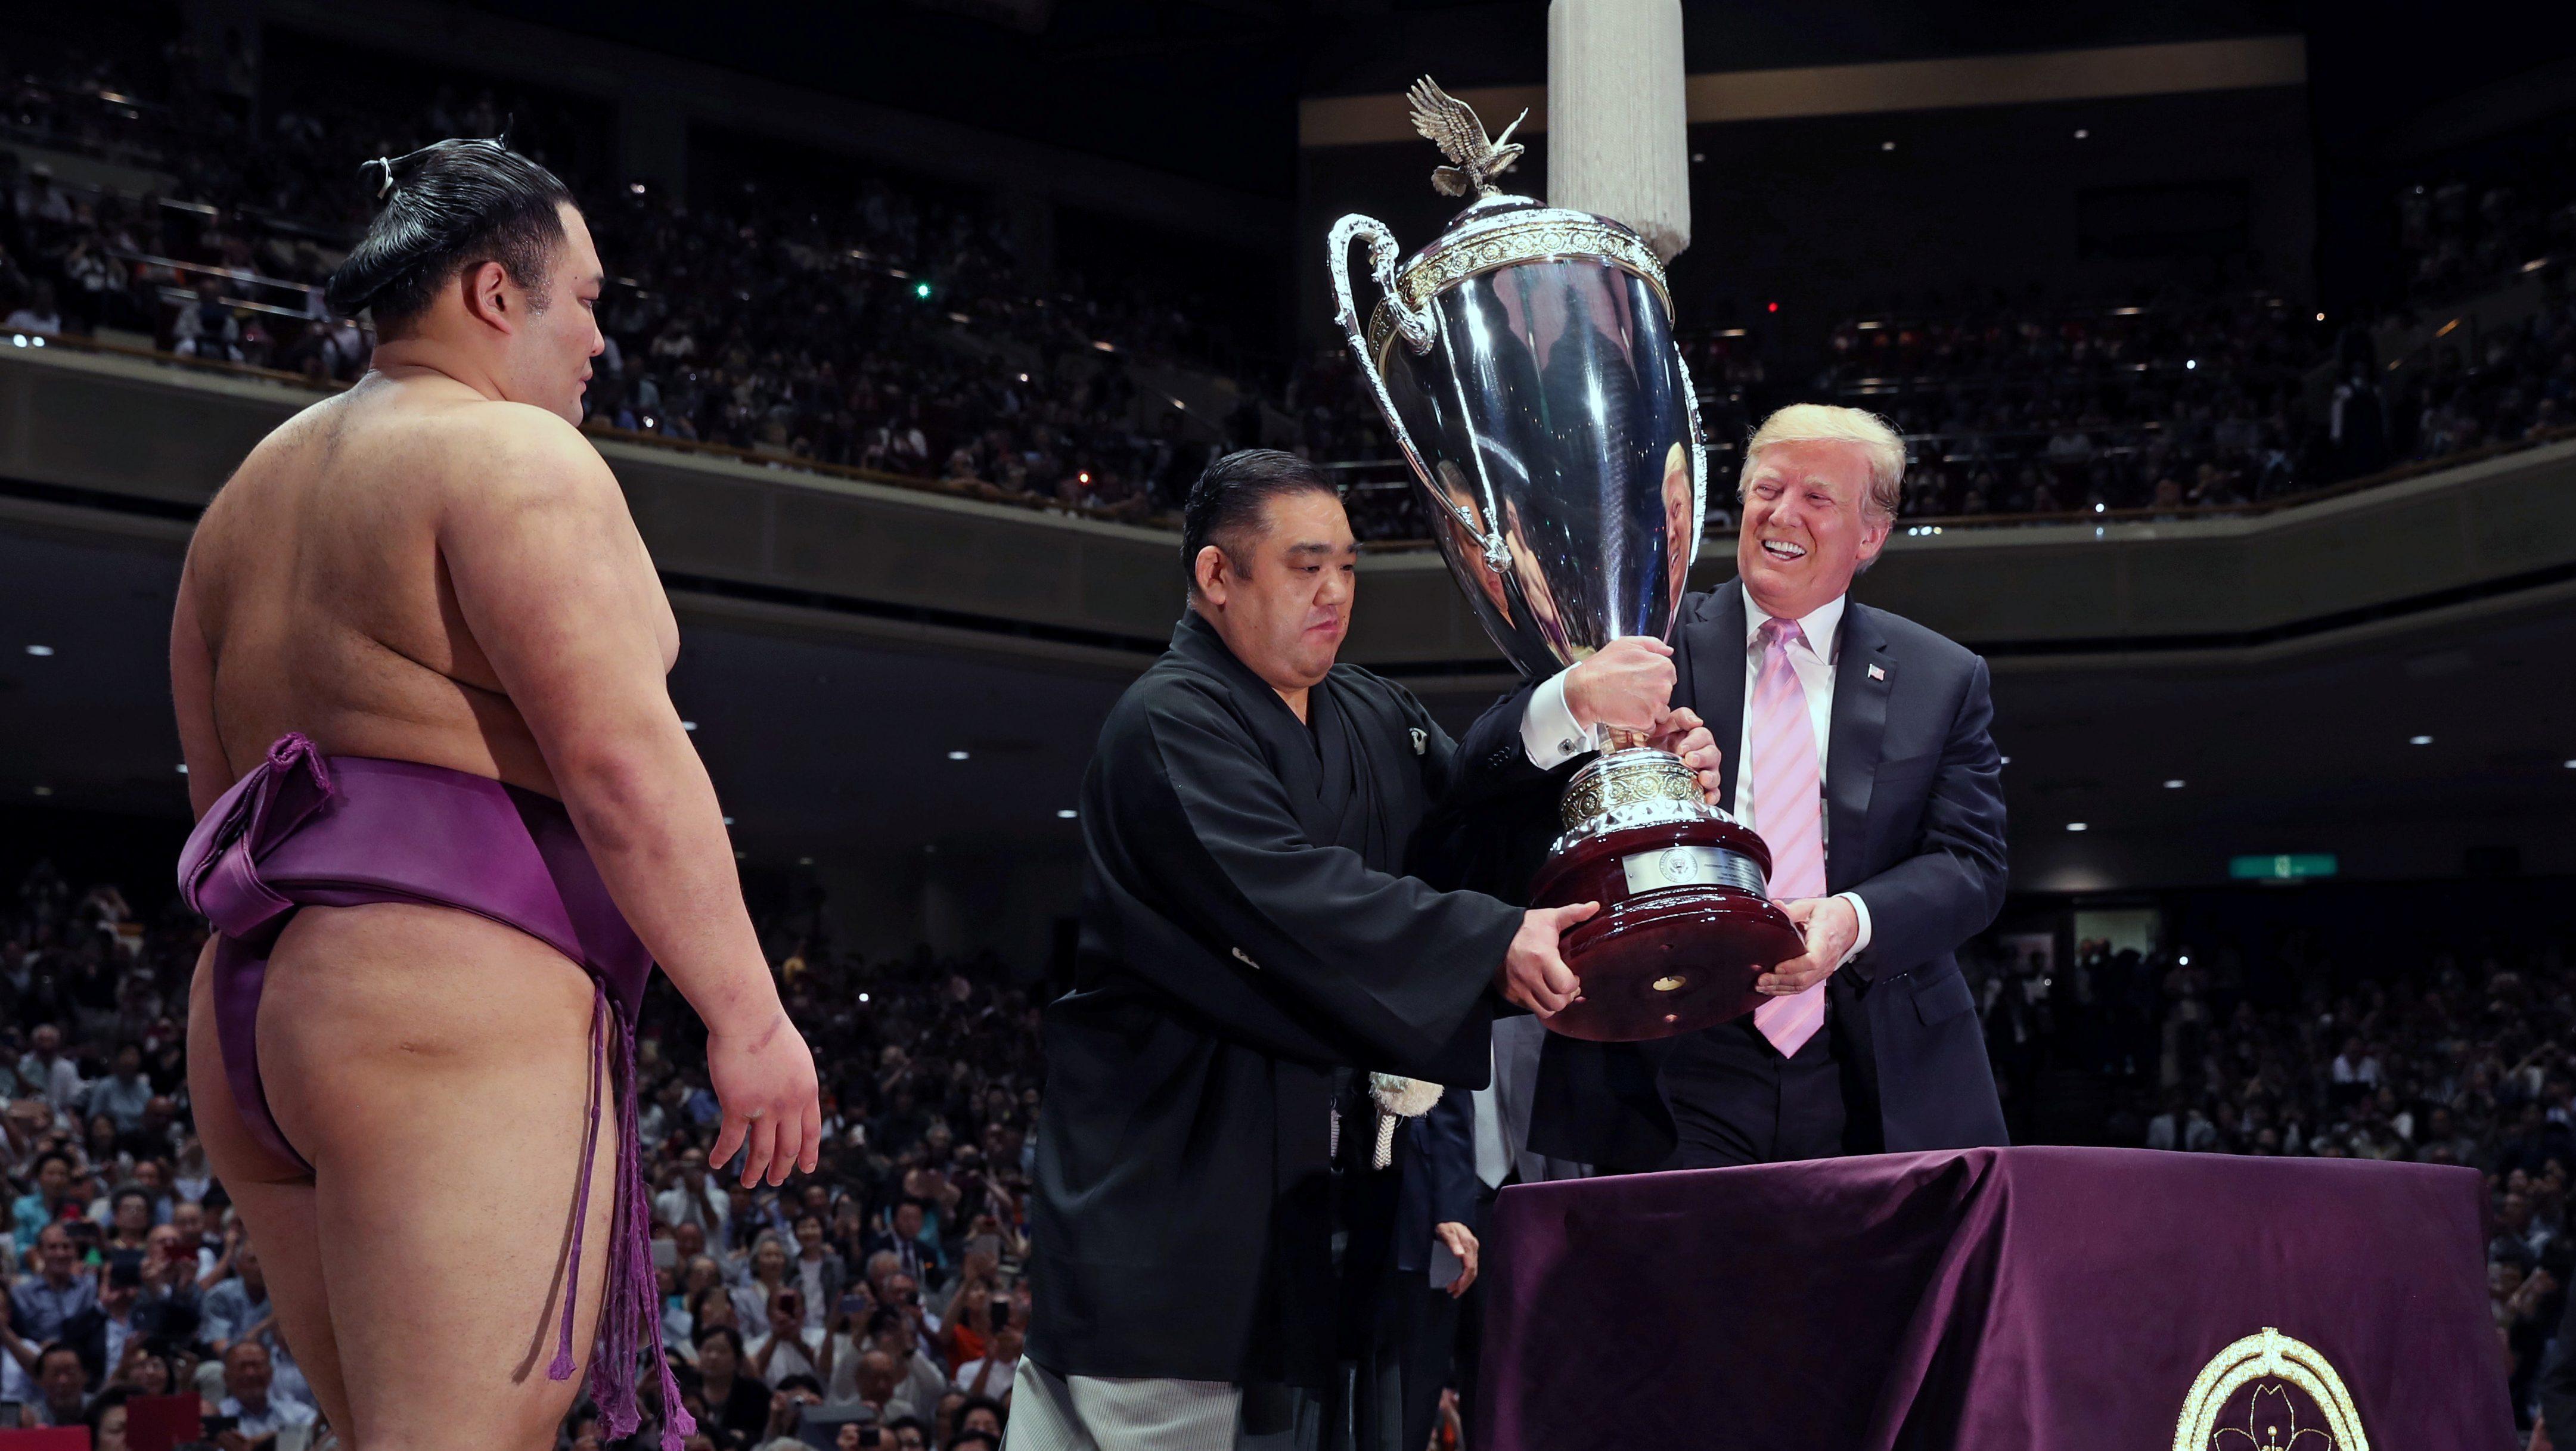 Donald-Trump-presenting-sumo-trophy-in-Tokyo